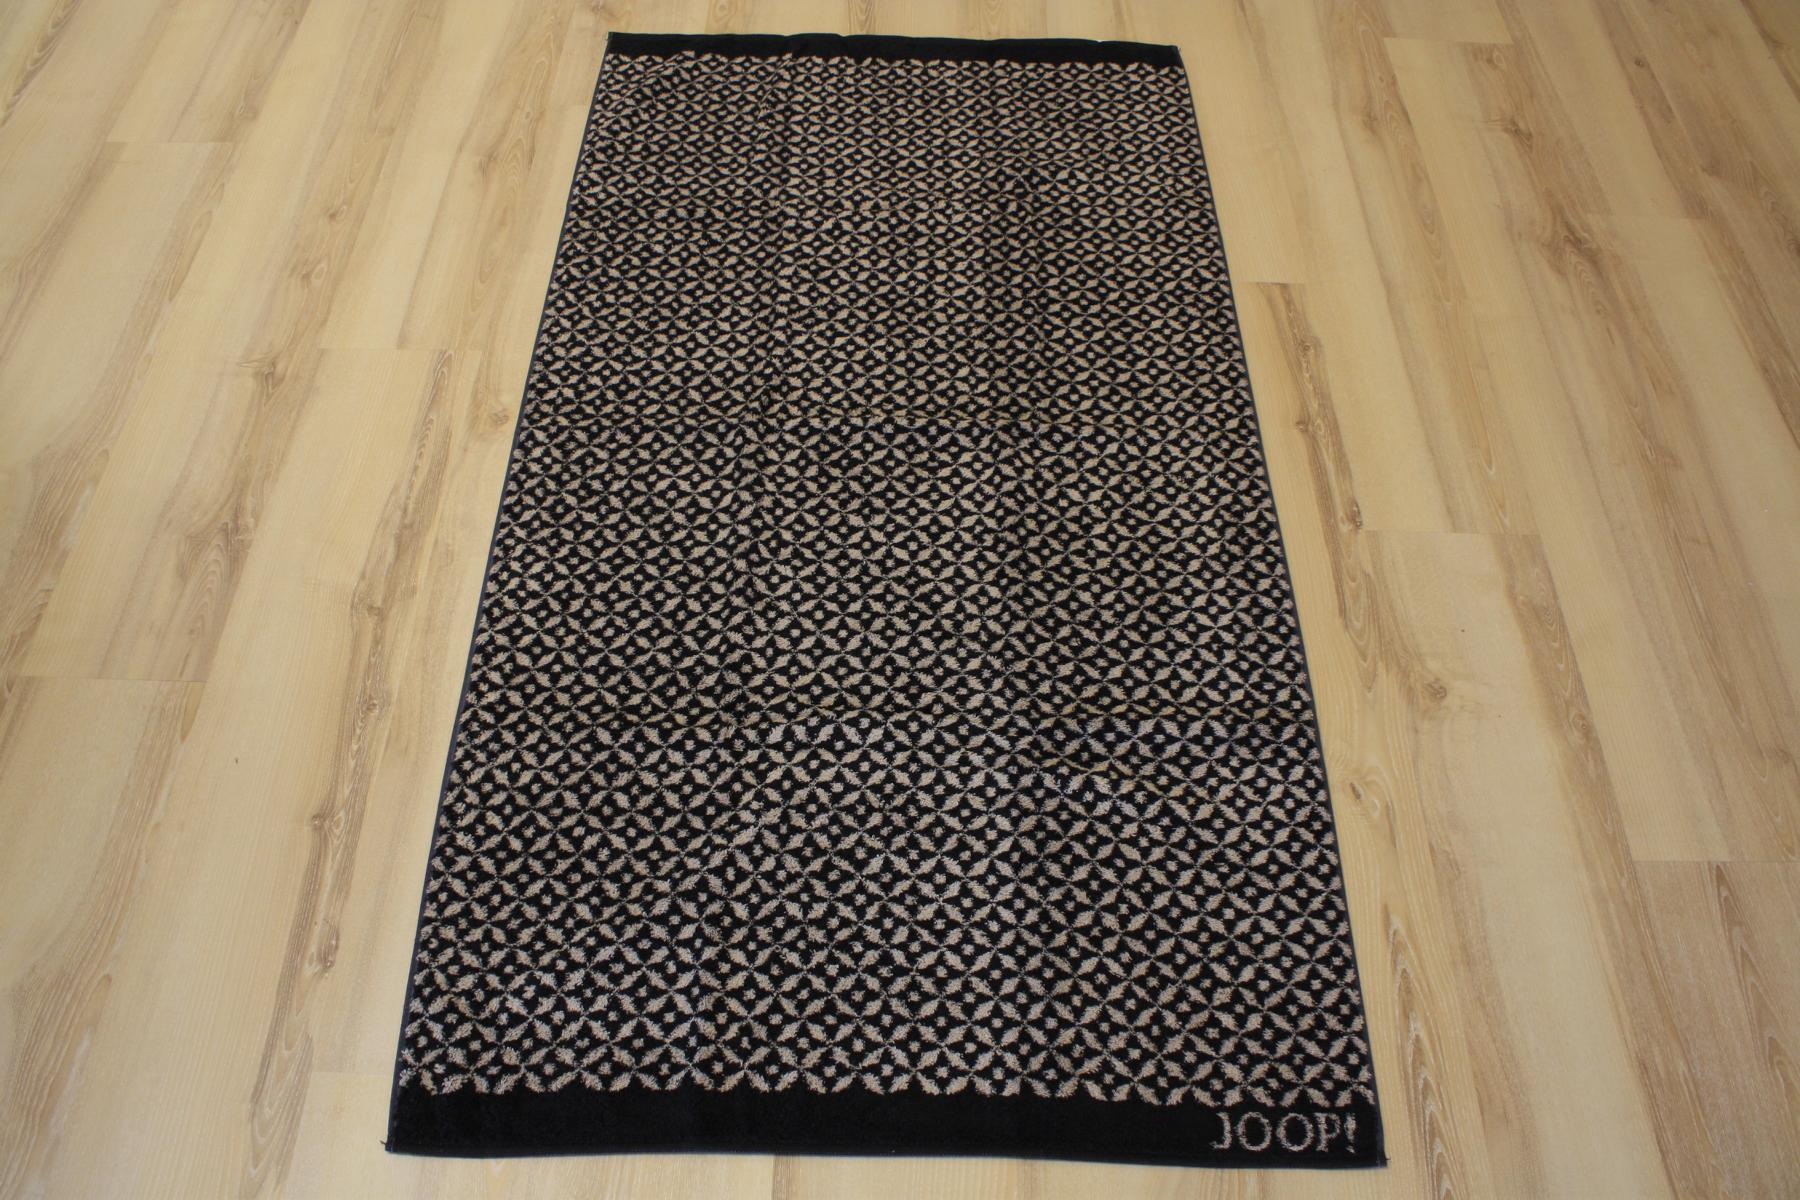 joop duschtuch badetuch 1653 allover 93 schwarz 80x150cm. Black Bedroom Furniture Sets. Home Design Ideas